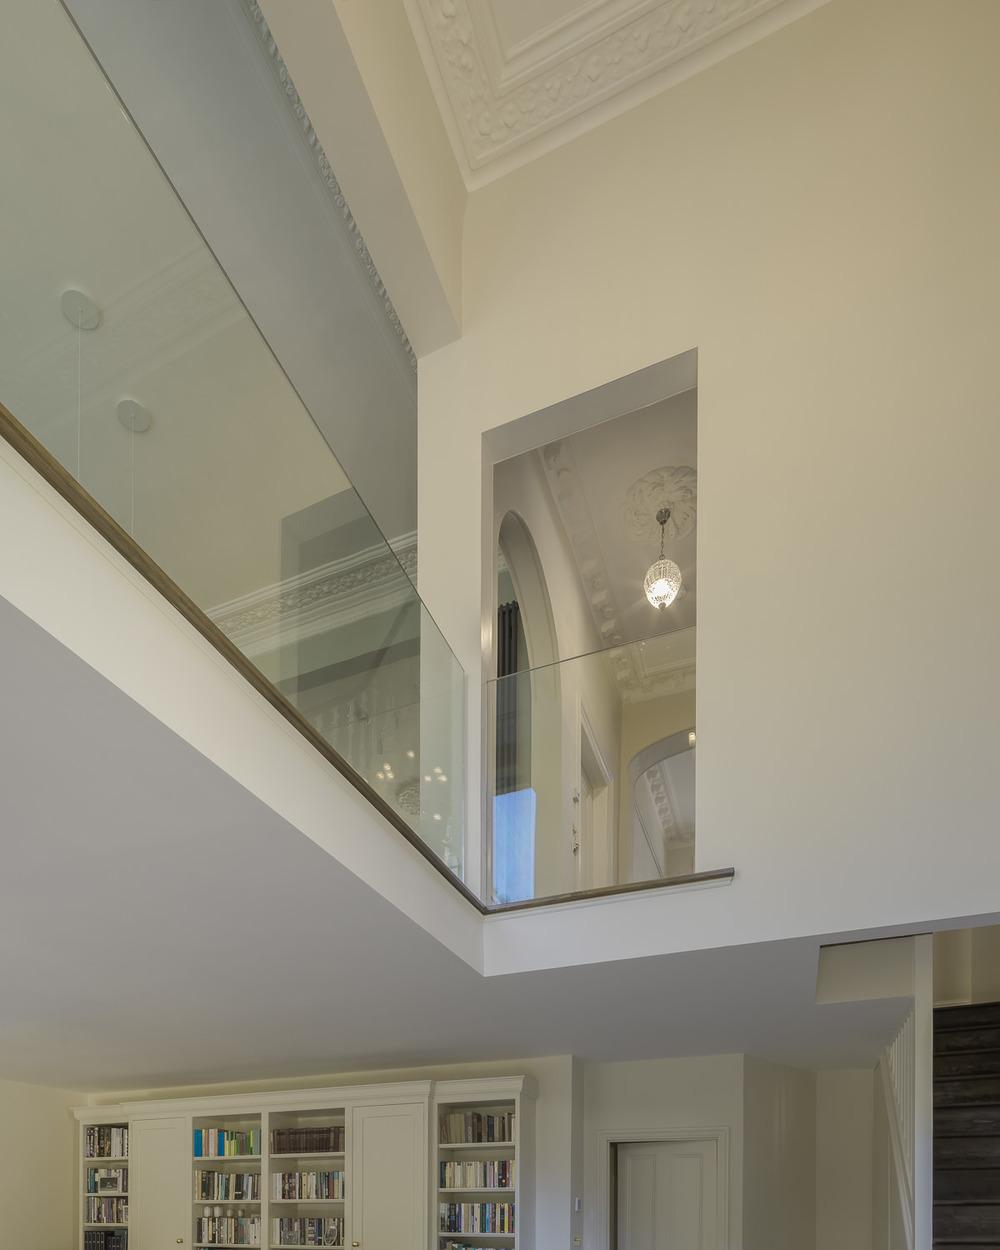 mark-hadden-architecture-photographer-architectuur-interieur-fotografie-london-amsterdam-nimtim-152-Edit.jpg